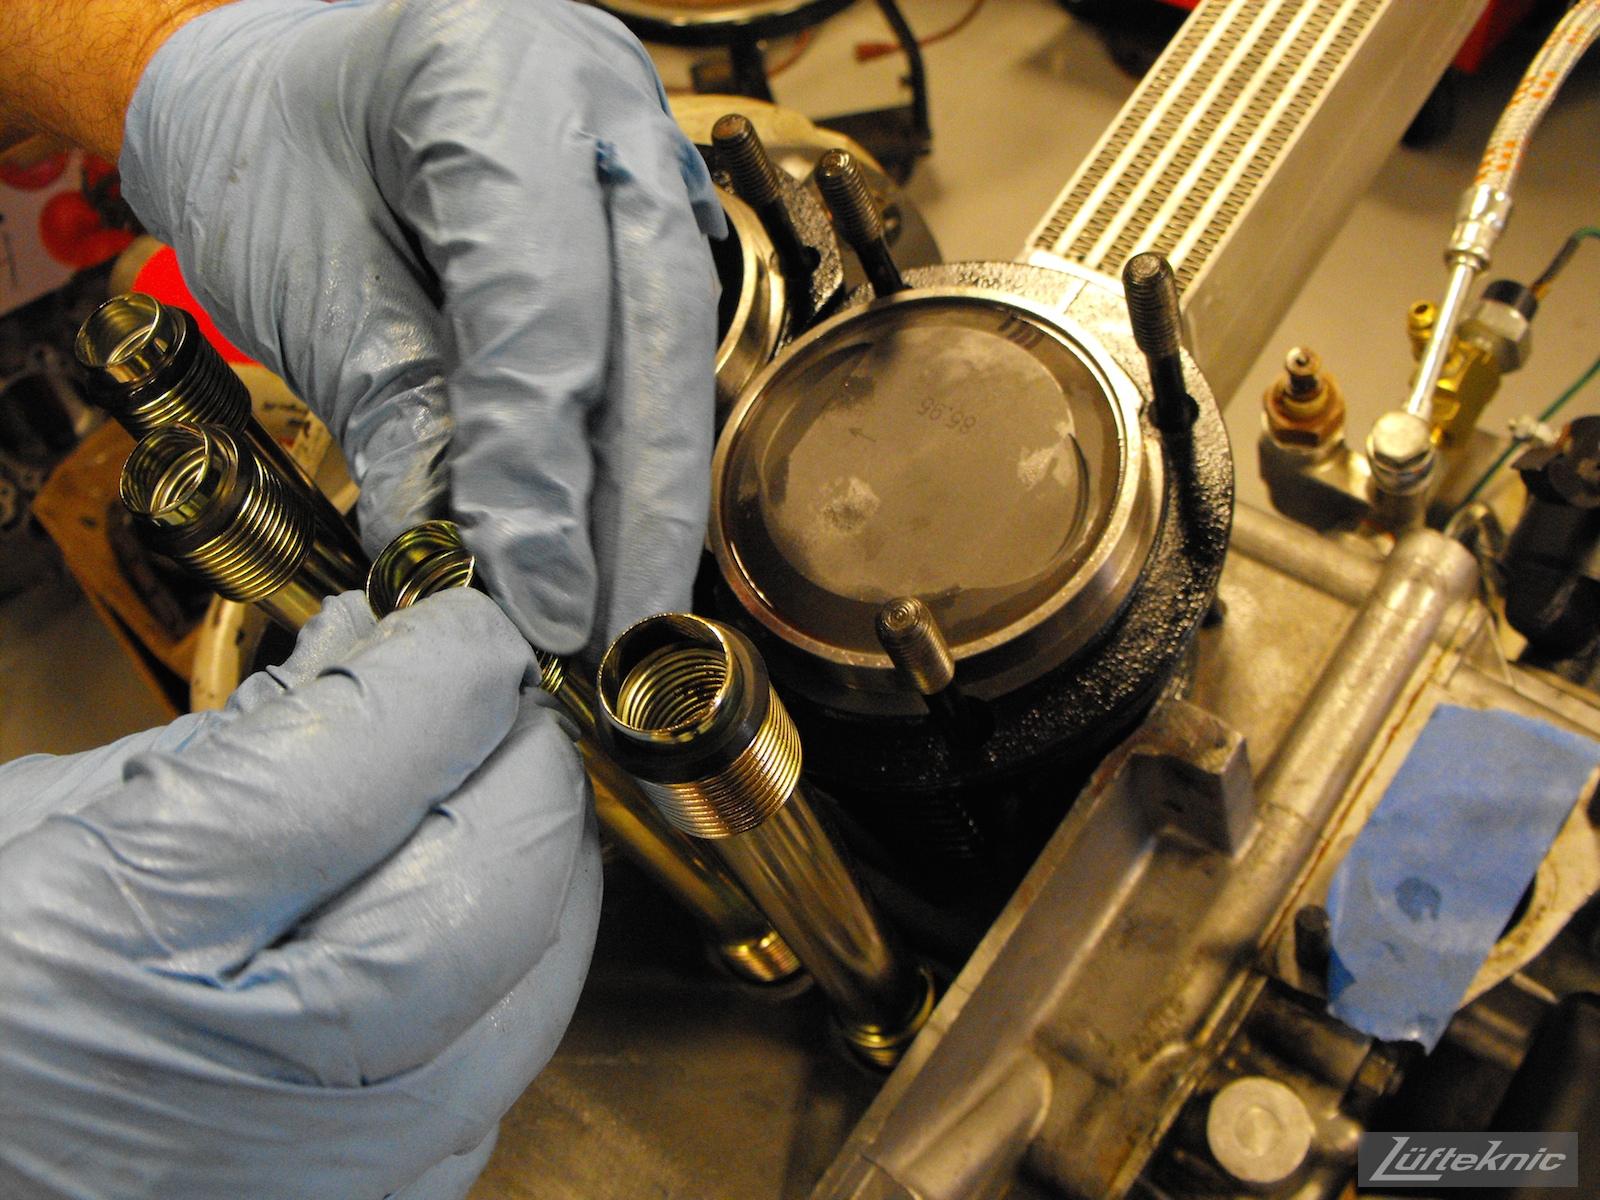 Installing oil return tubes for a 1961 Porsche 356B Roadster restoration.